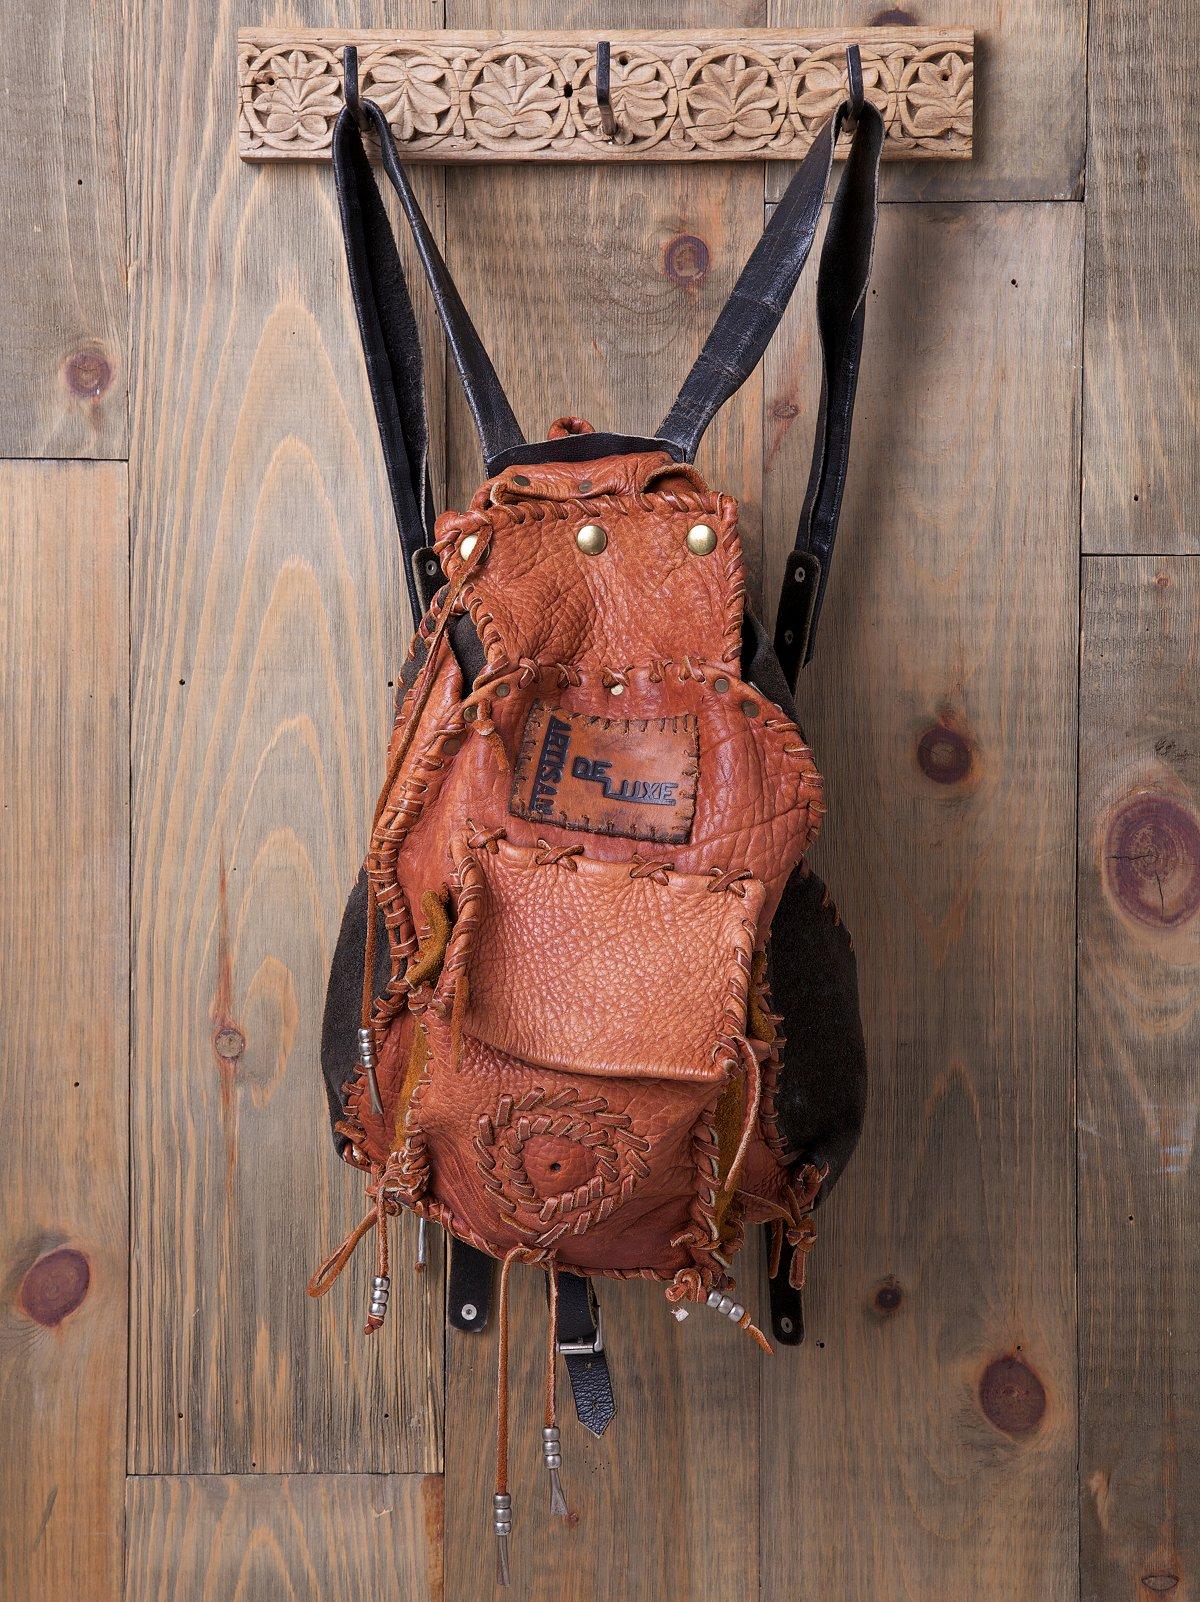 Vintage Patched Travels Backpack